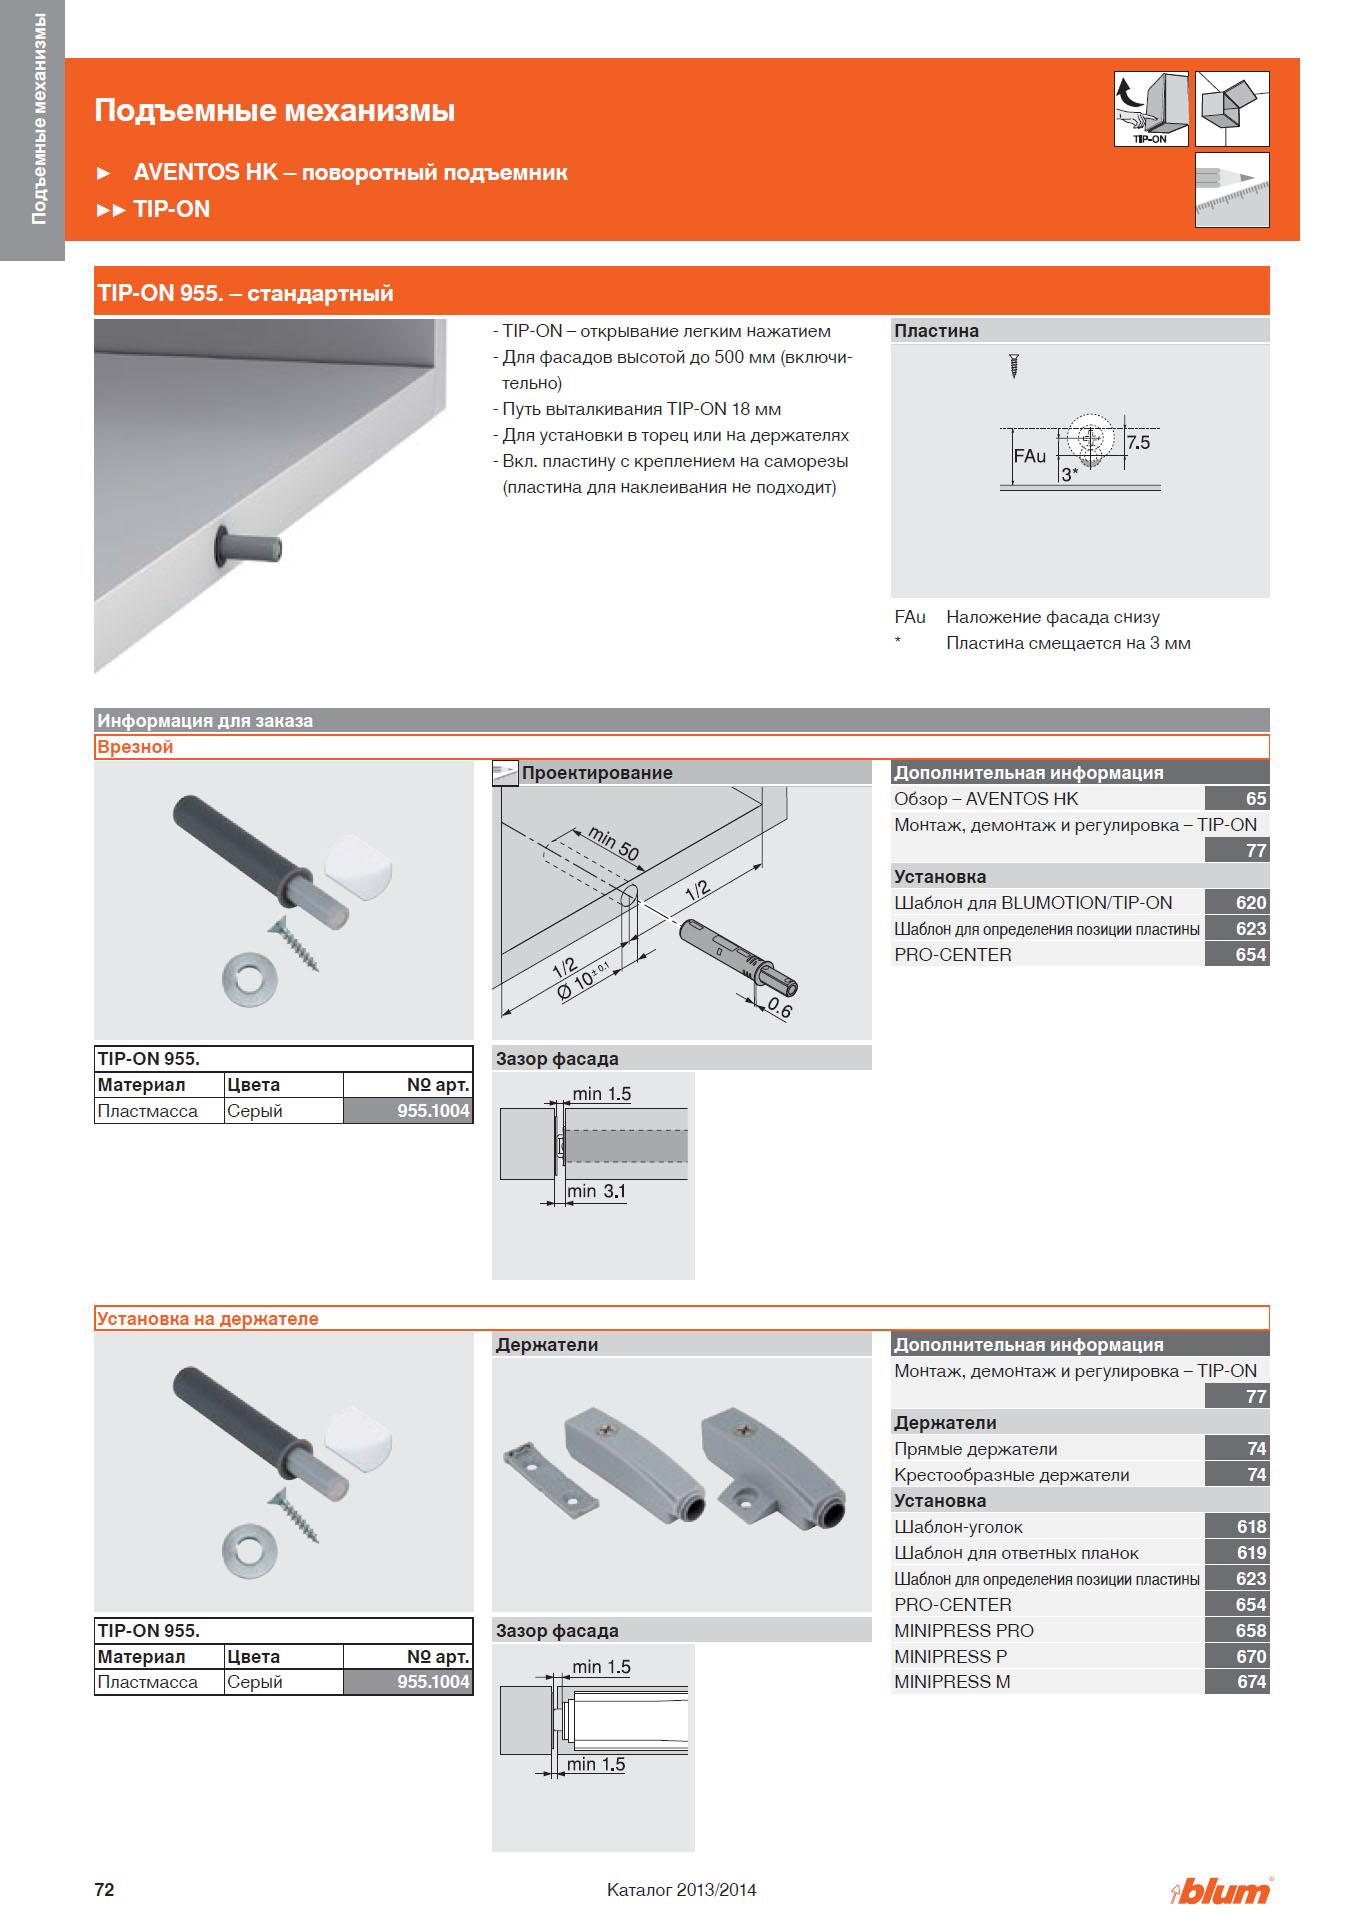 isuzu forward схема электро оборудования